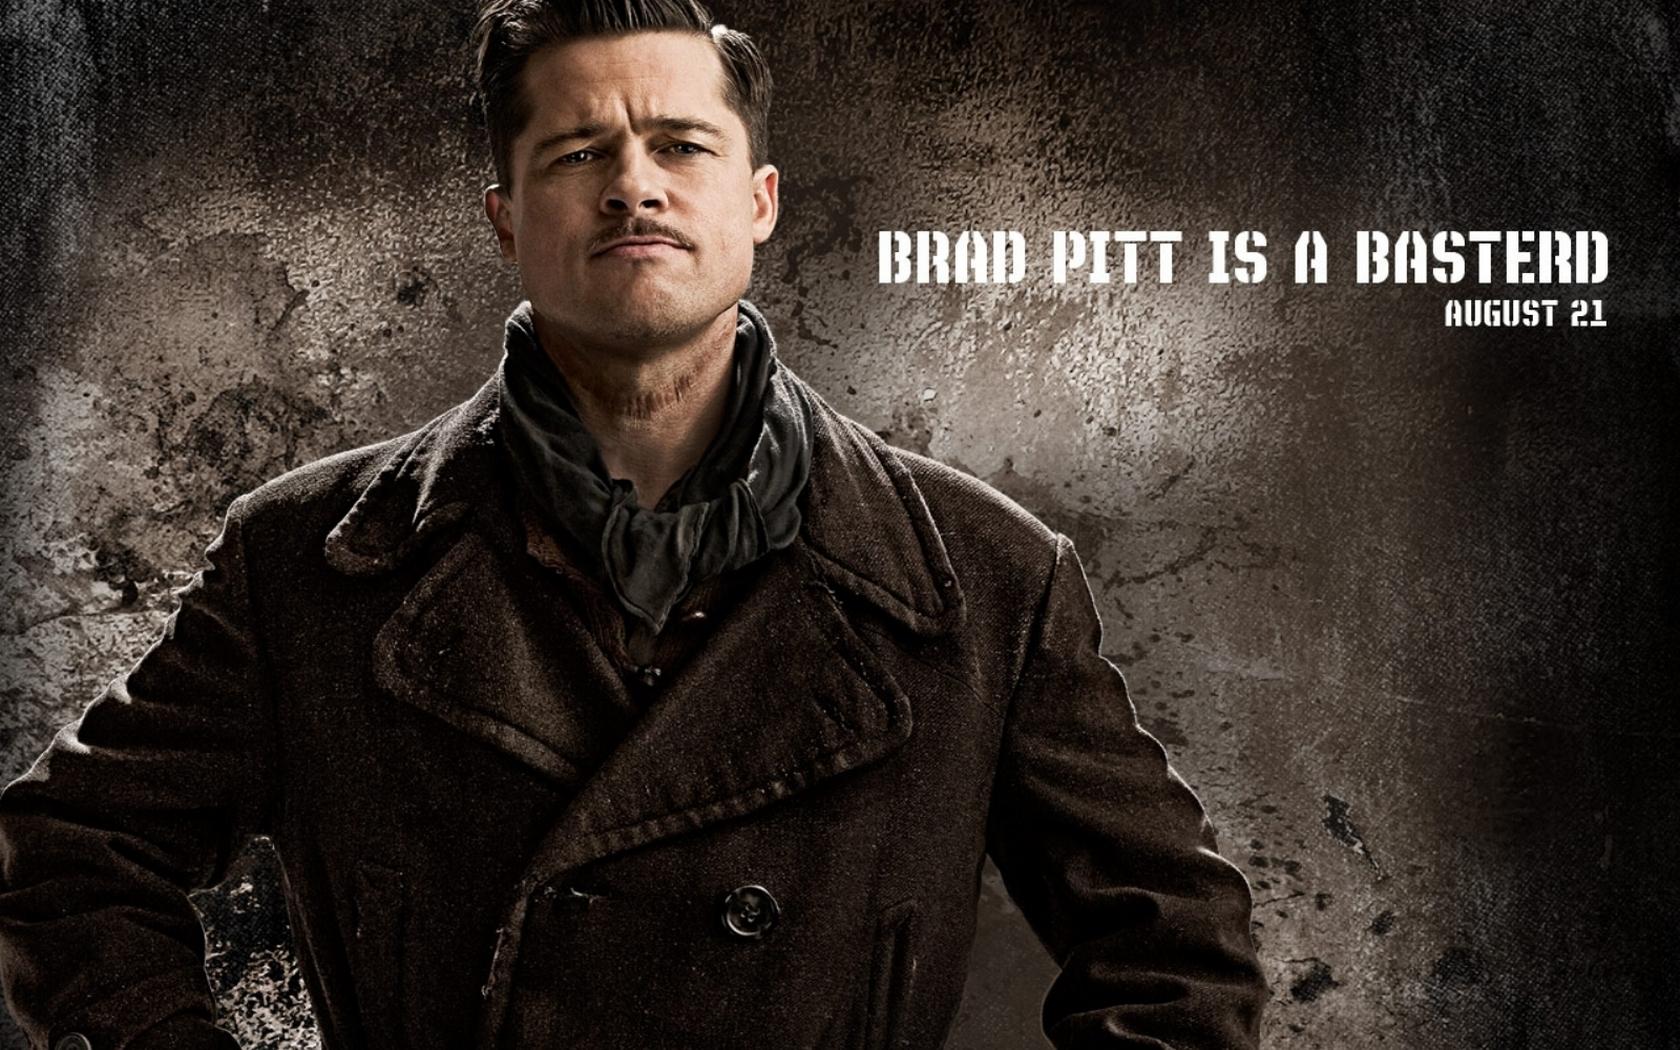 Brad Pitt actor - 1680x1050